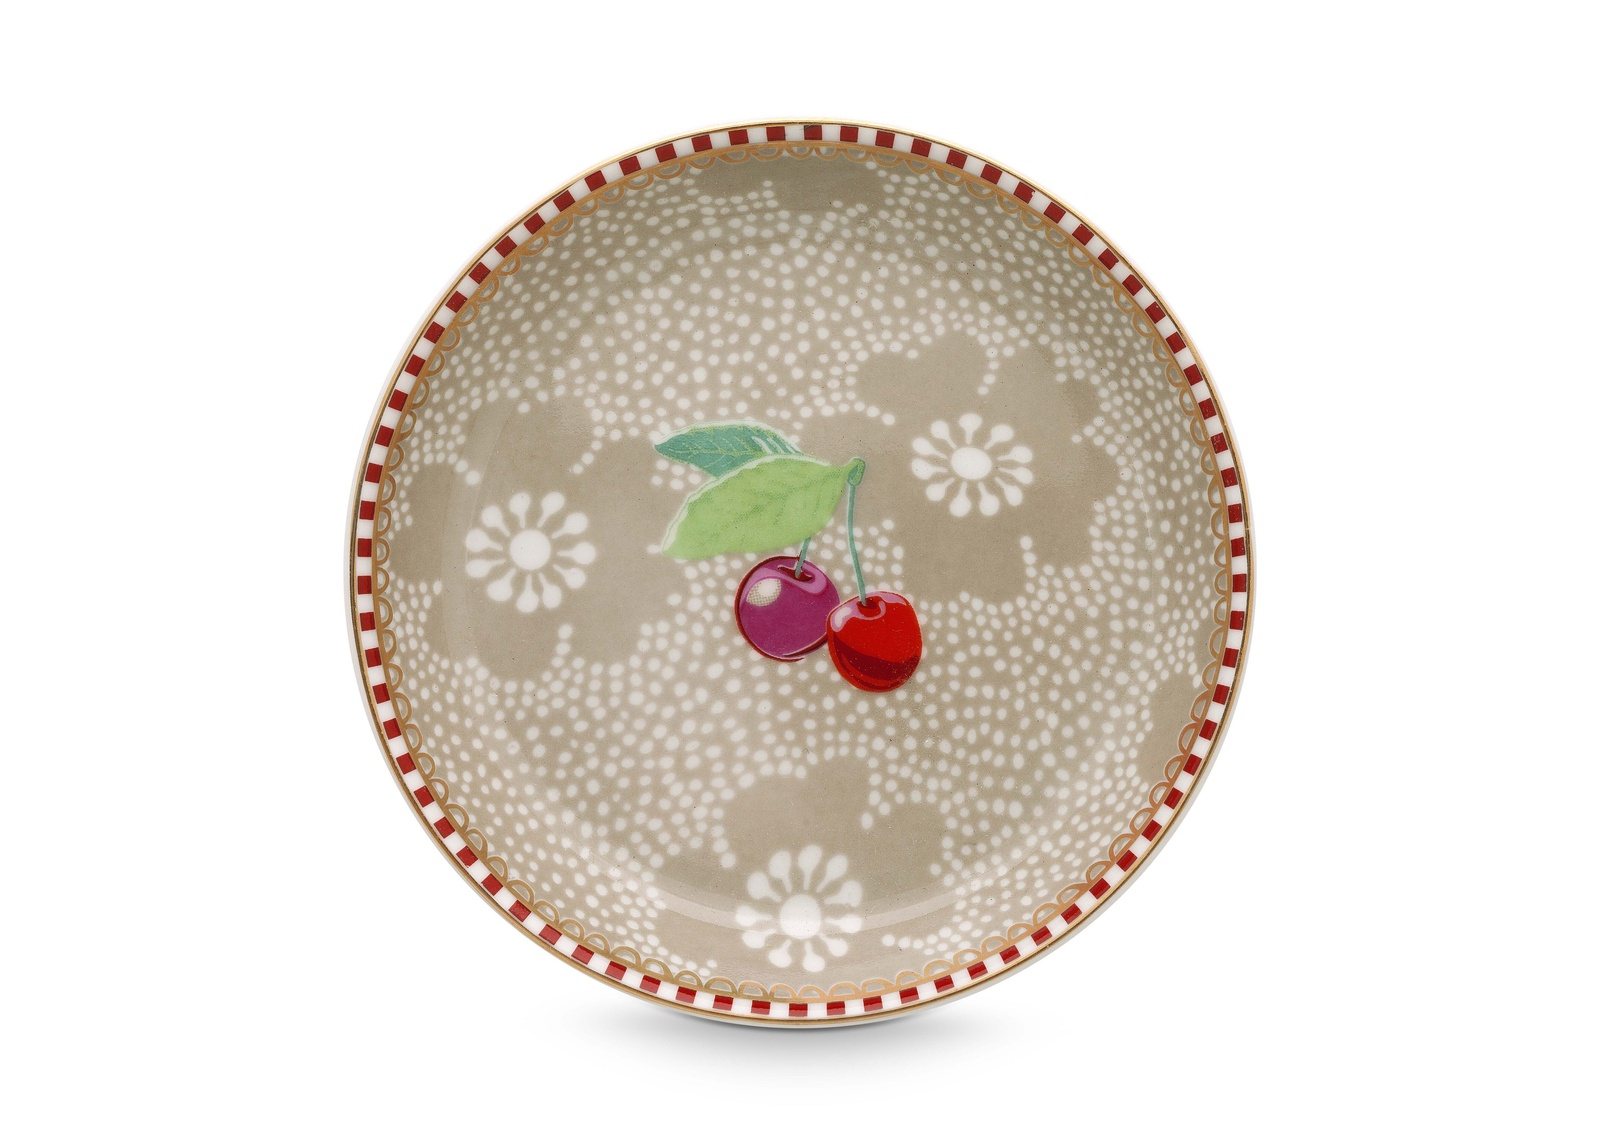 цена Набор из 2-х блюдец для чайных пакетиков Dotted Flower Khaki онлайн в 2017 году